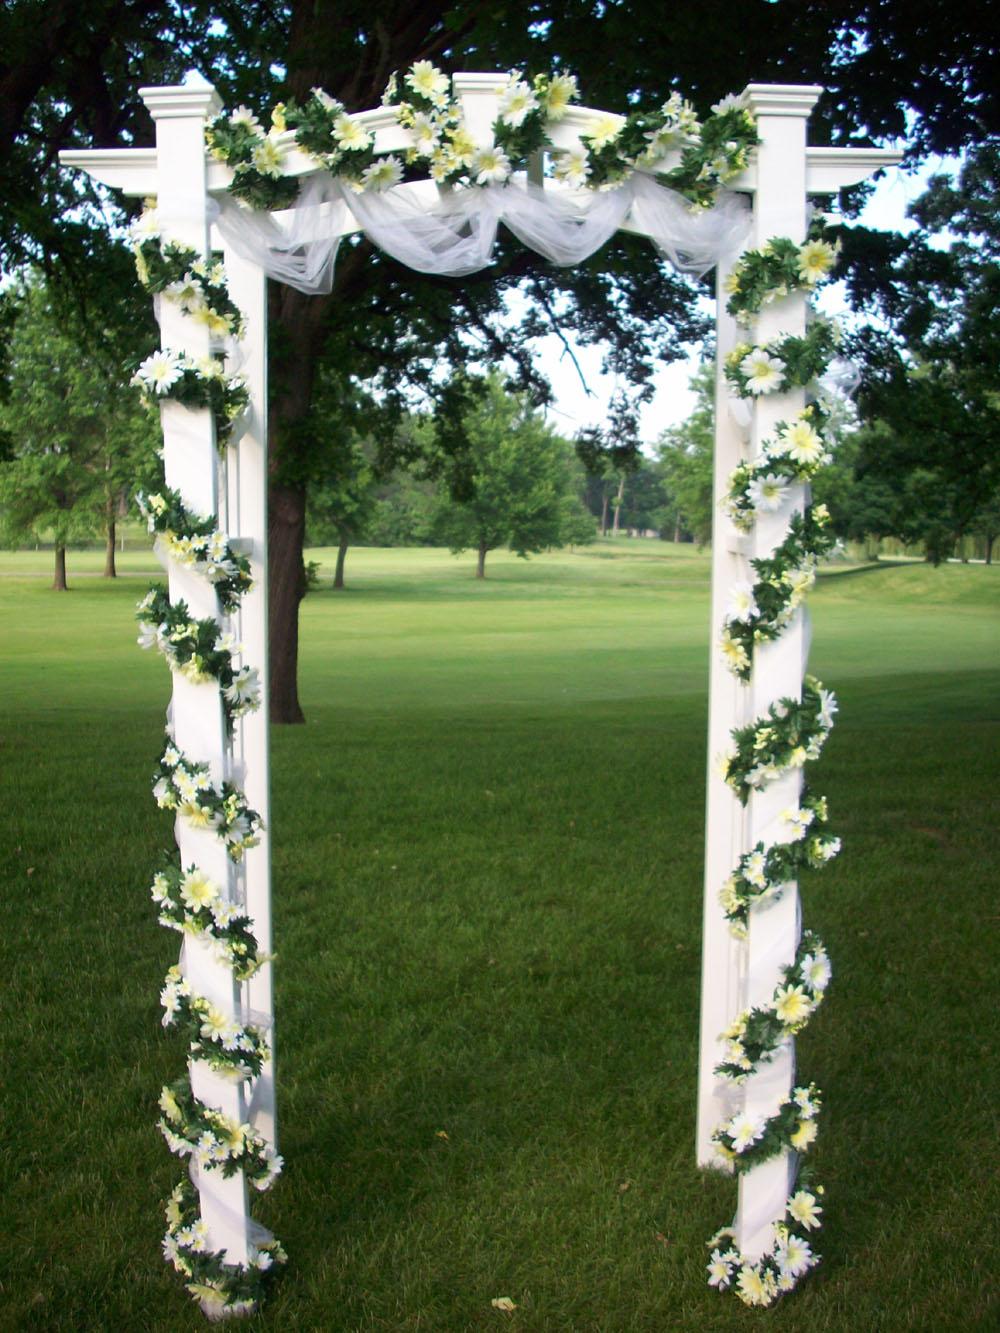 tag northwest indiana wedding planning&paged 2 wedding arbor Daisy Arbor